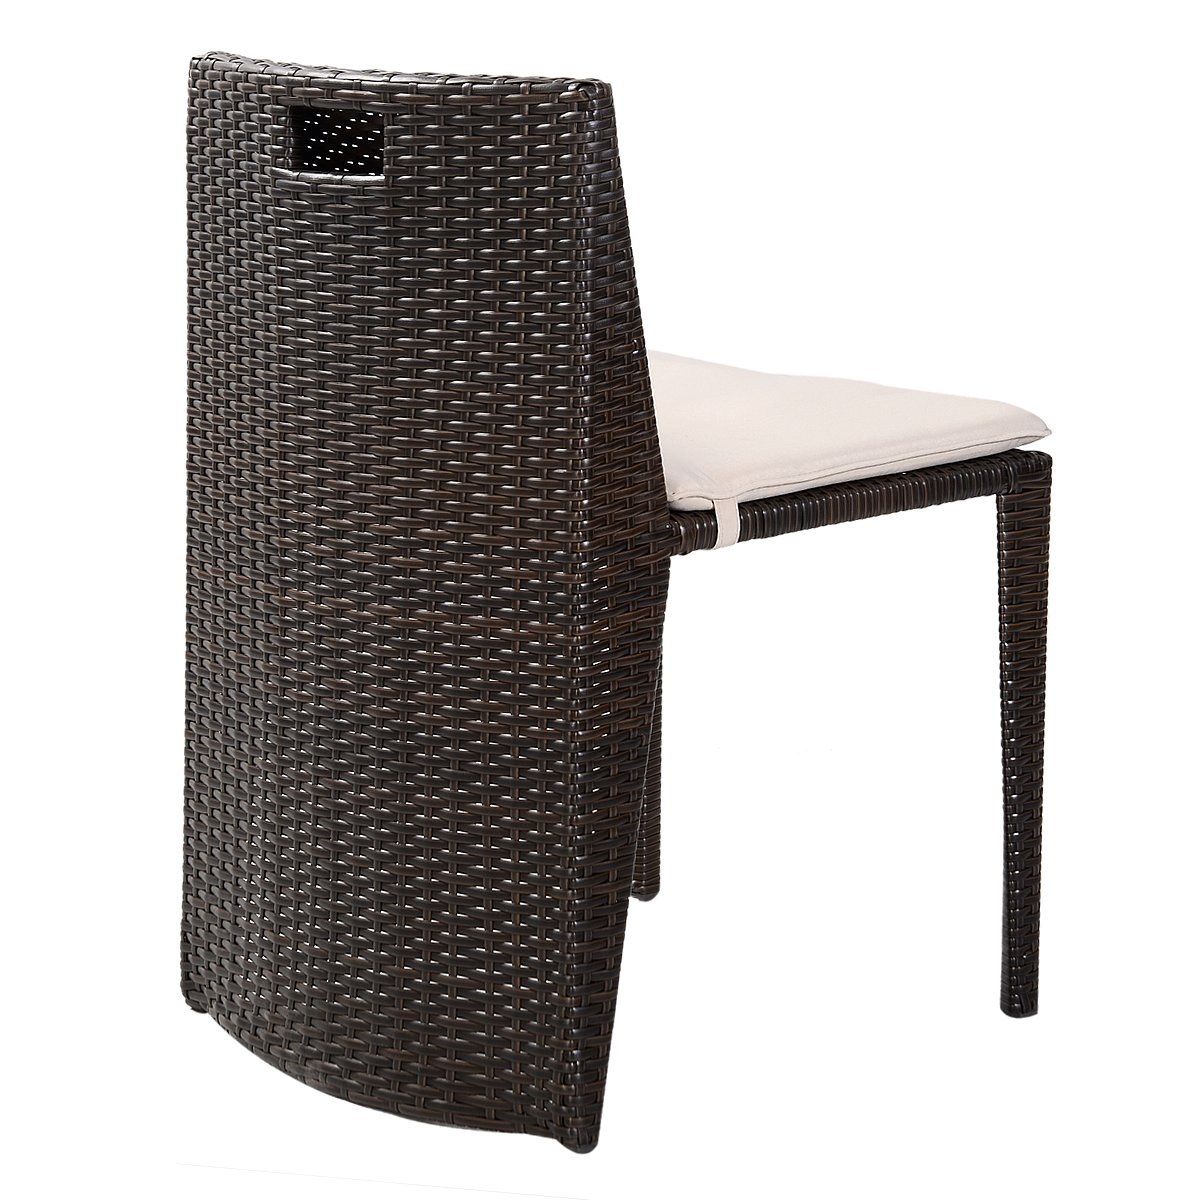 Amazon.com : Goplus 3 PCS Cushioned Outdoor Wicker Patio Set Seat ...